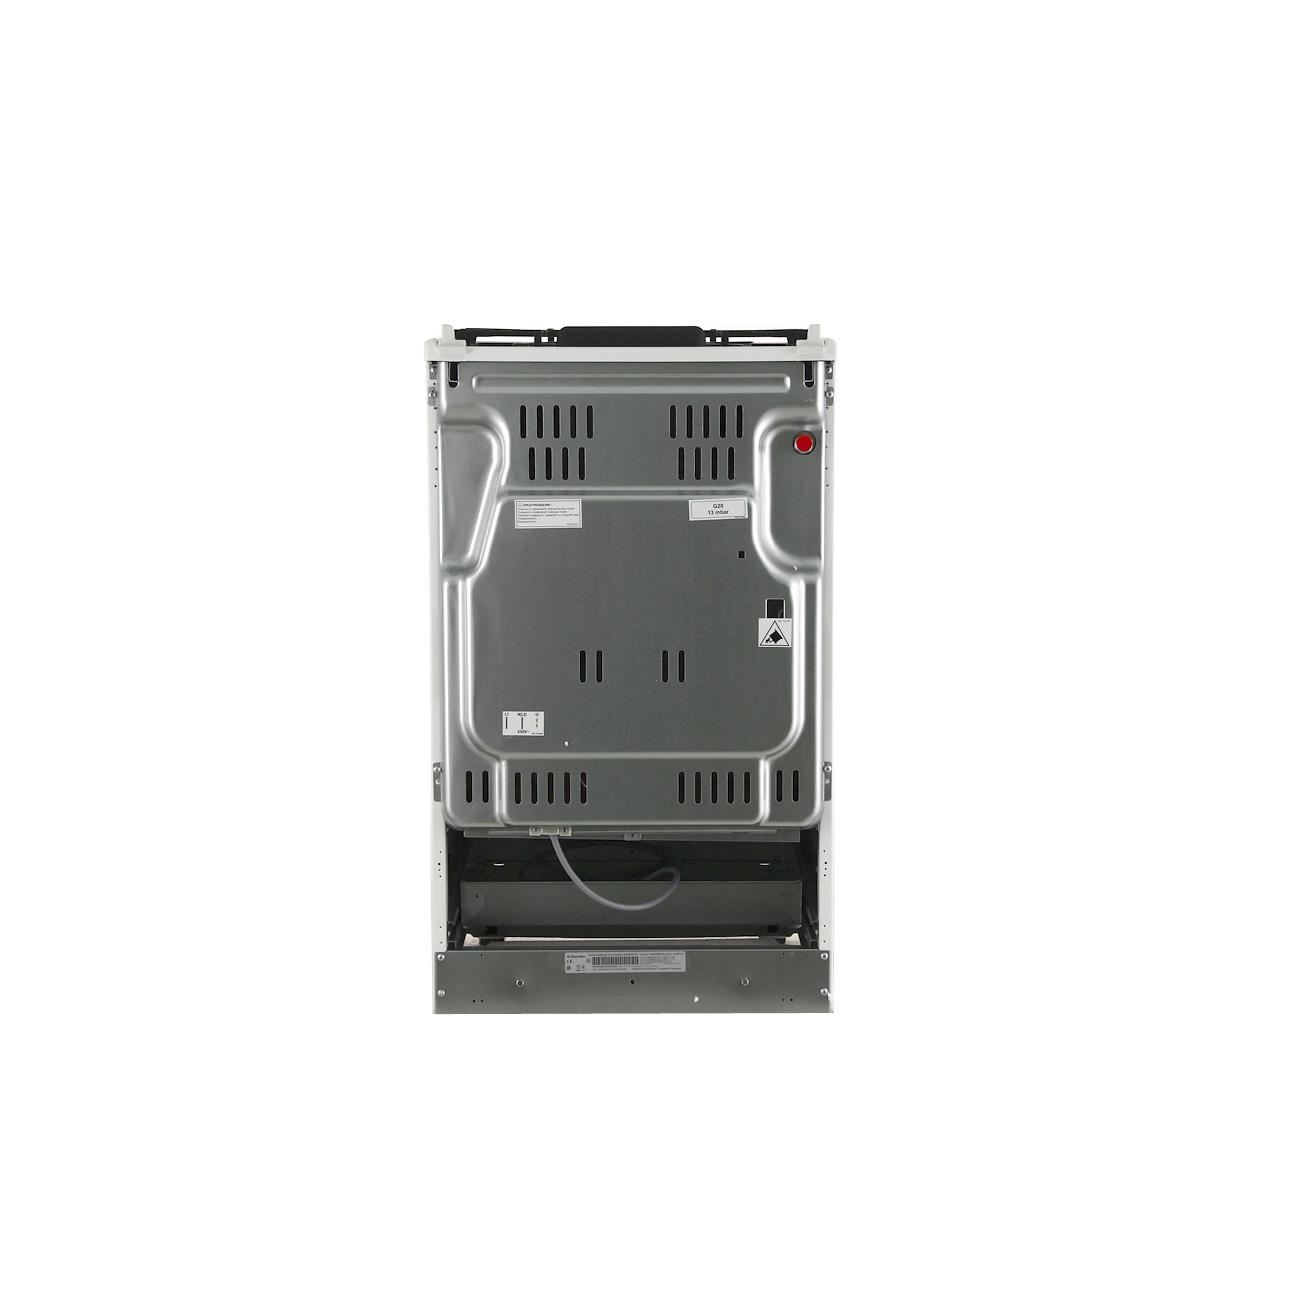 Купить Газовая плита (50-55 см) Electrolux EKK954507W недорого